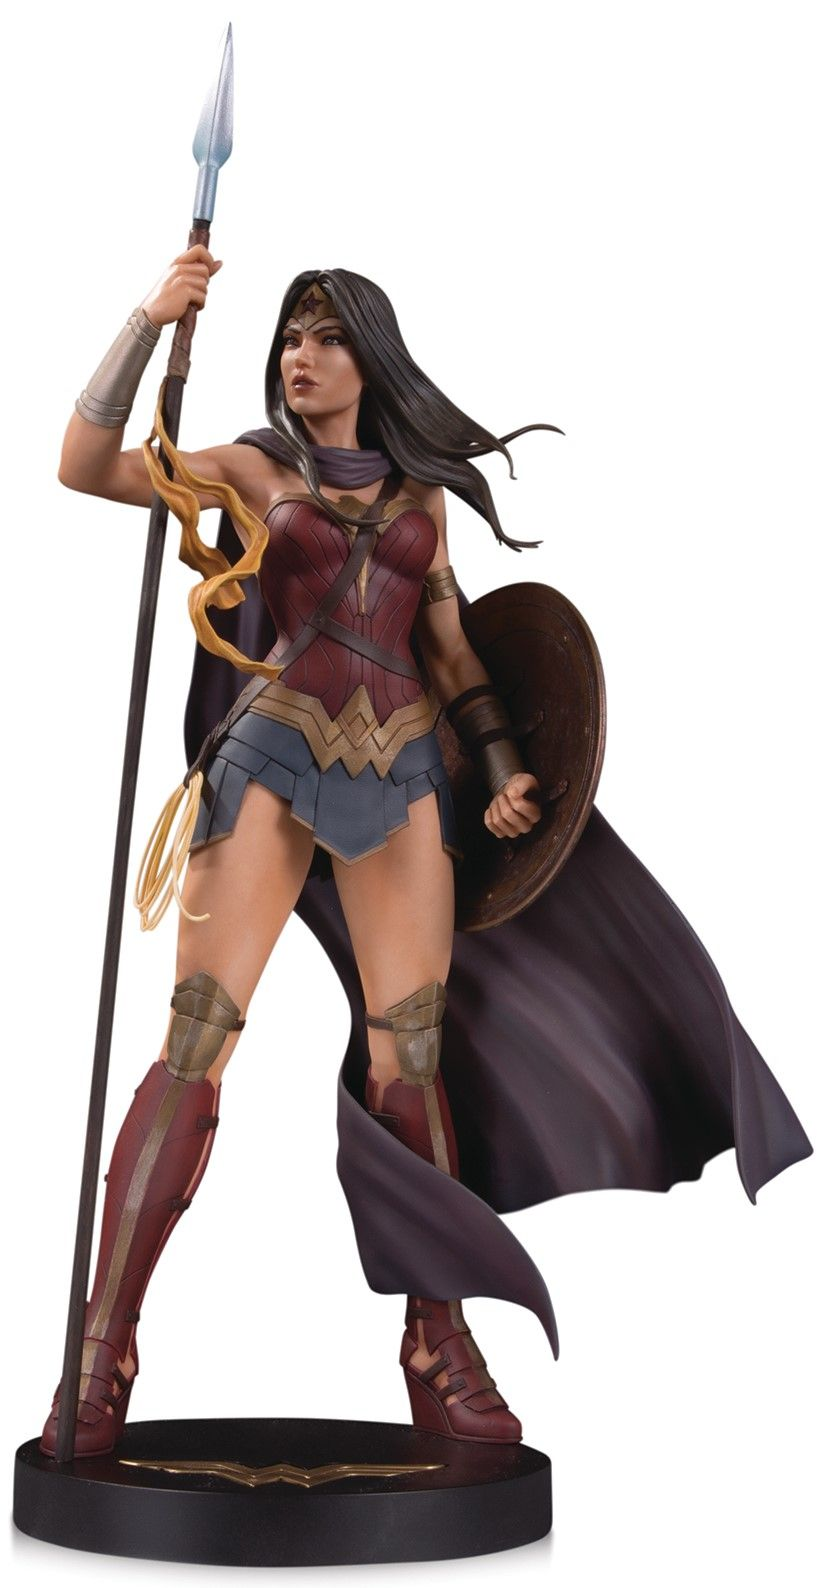 Фигура Diamond Select DC Designer Series - Wonder Woman, 40 cm - 1